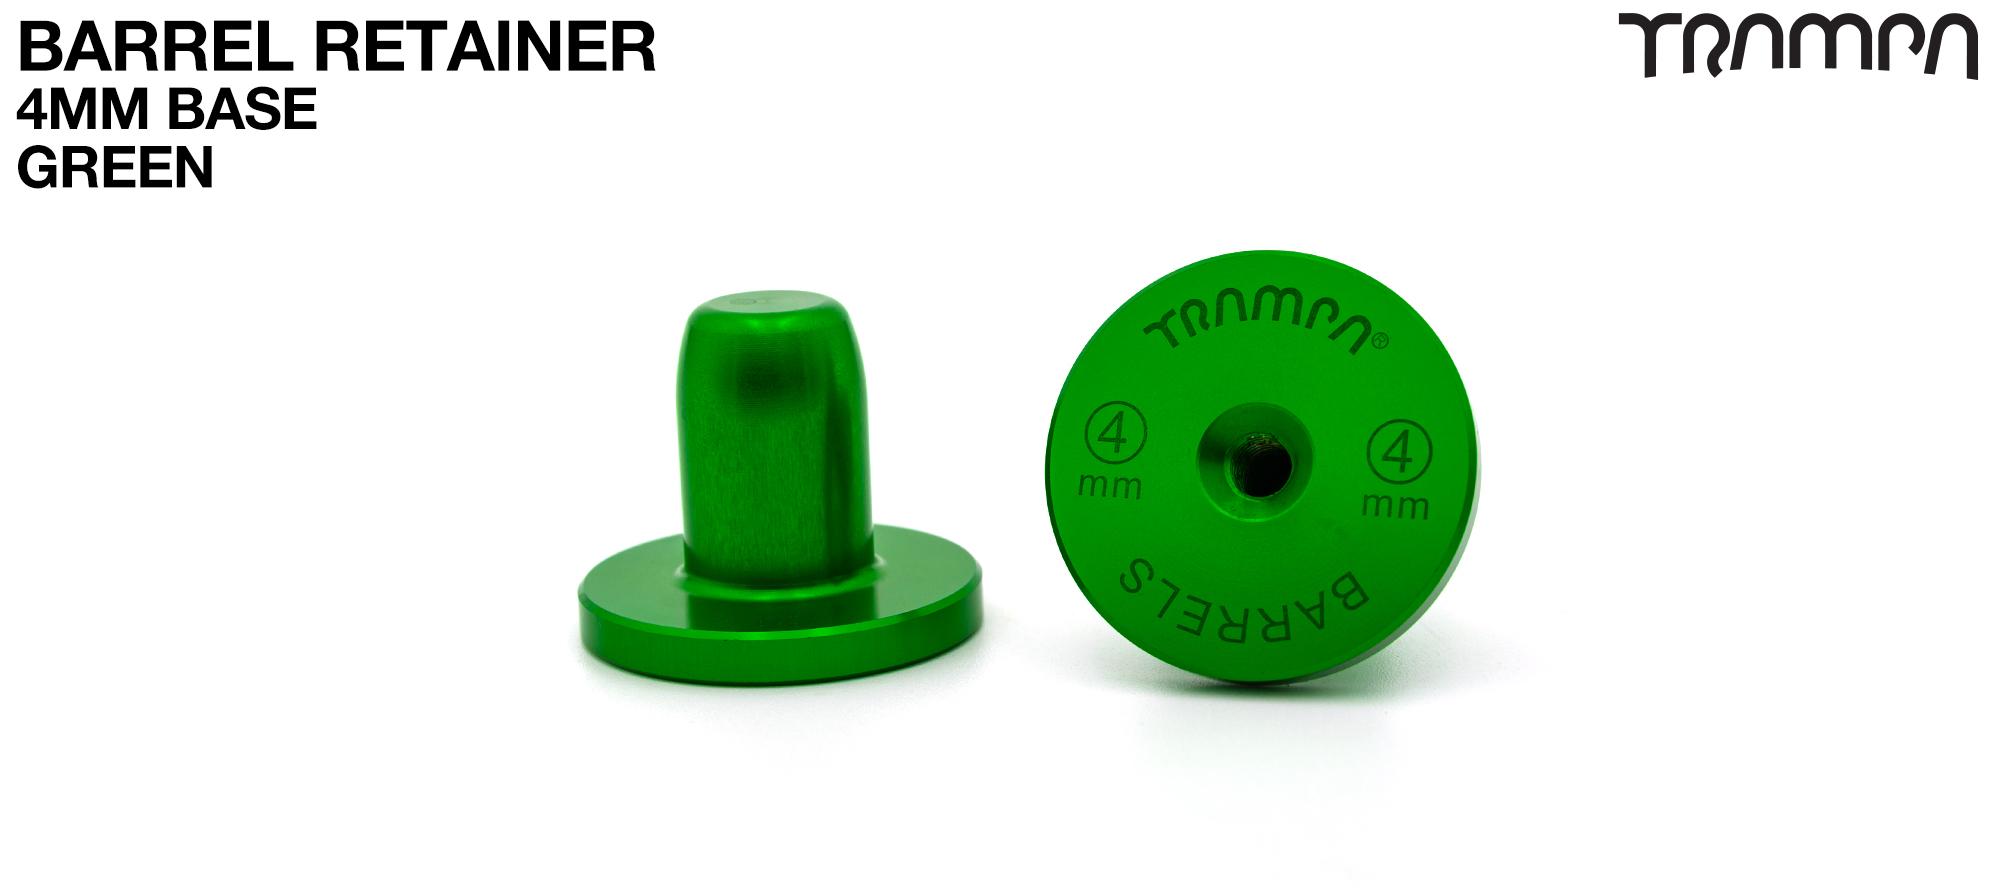 BARRELS Retainer 4mm BASE - GREEN